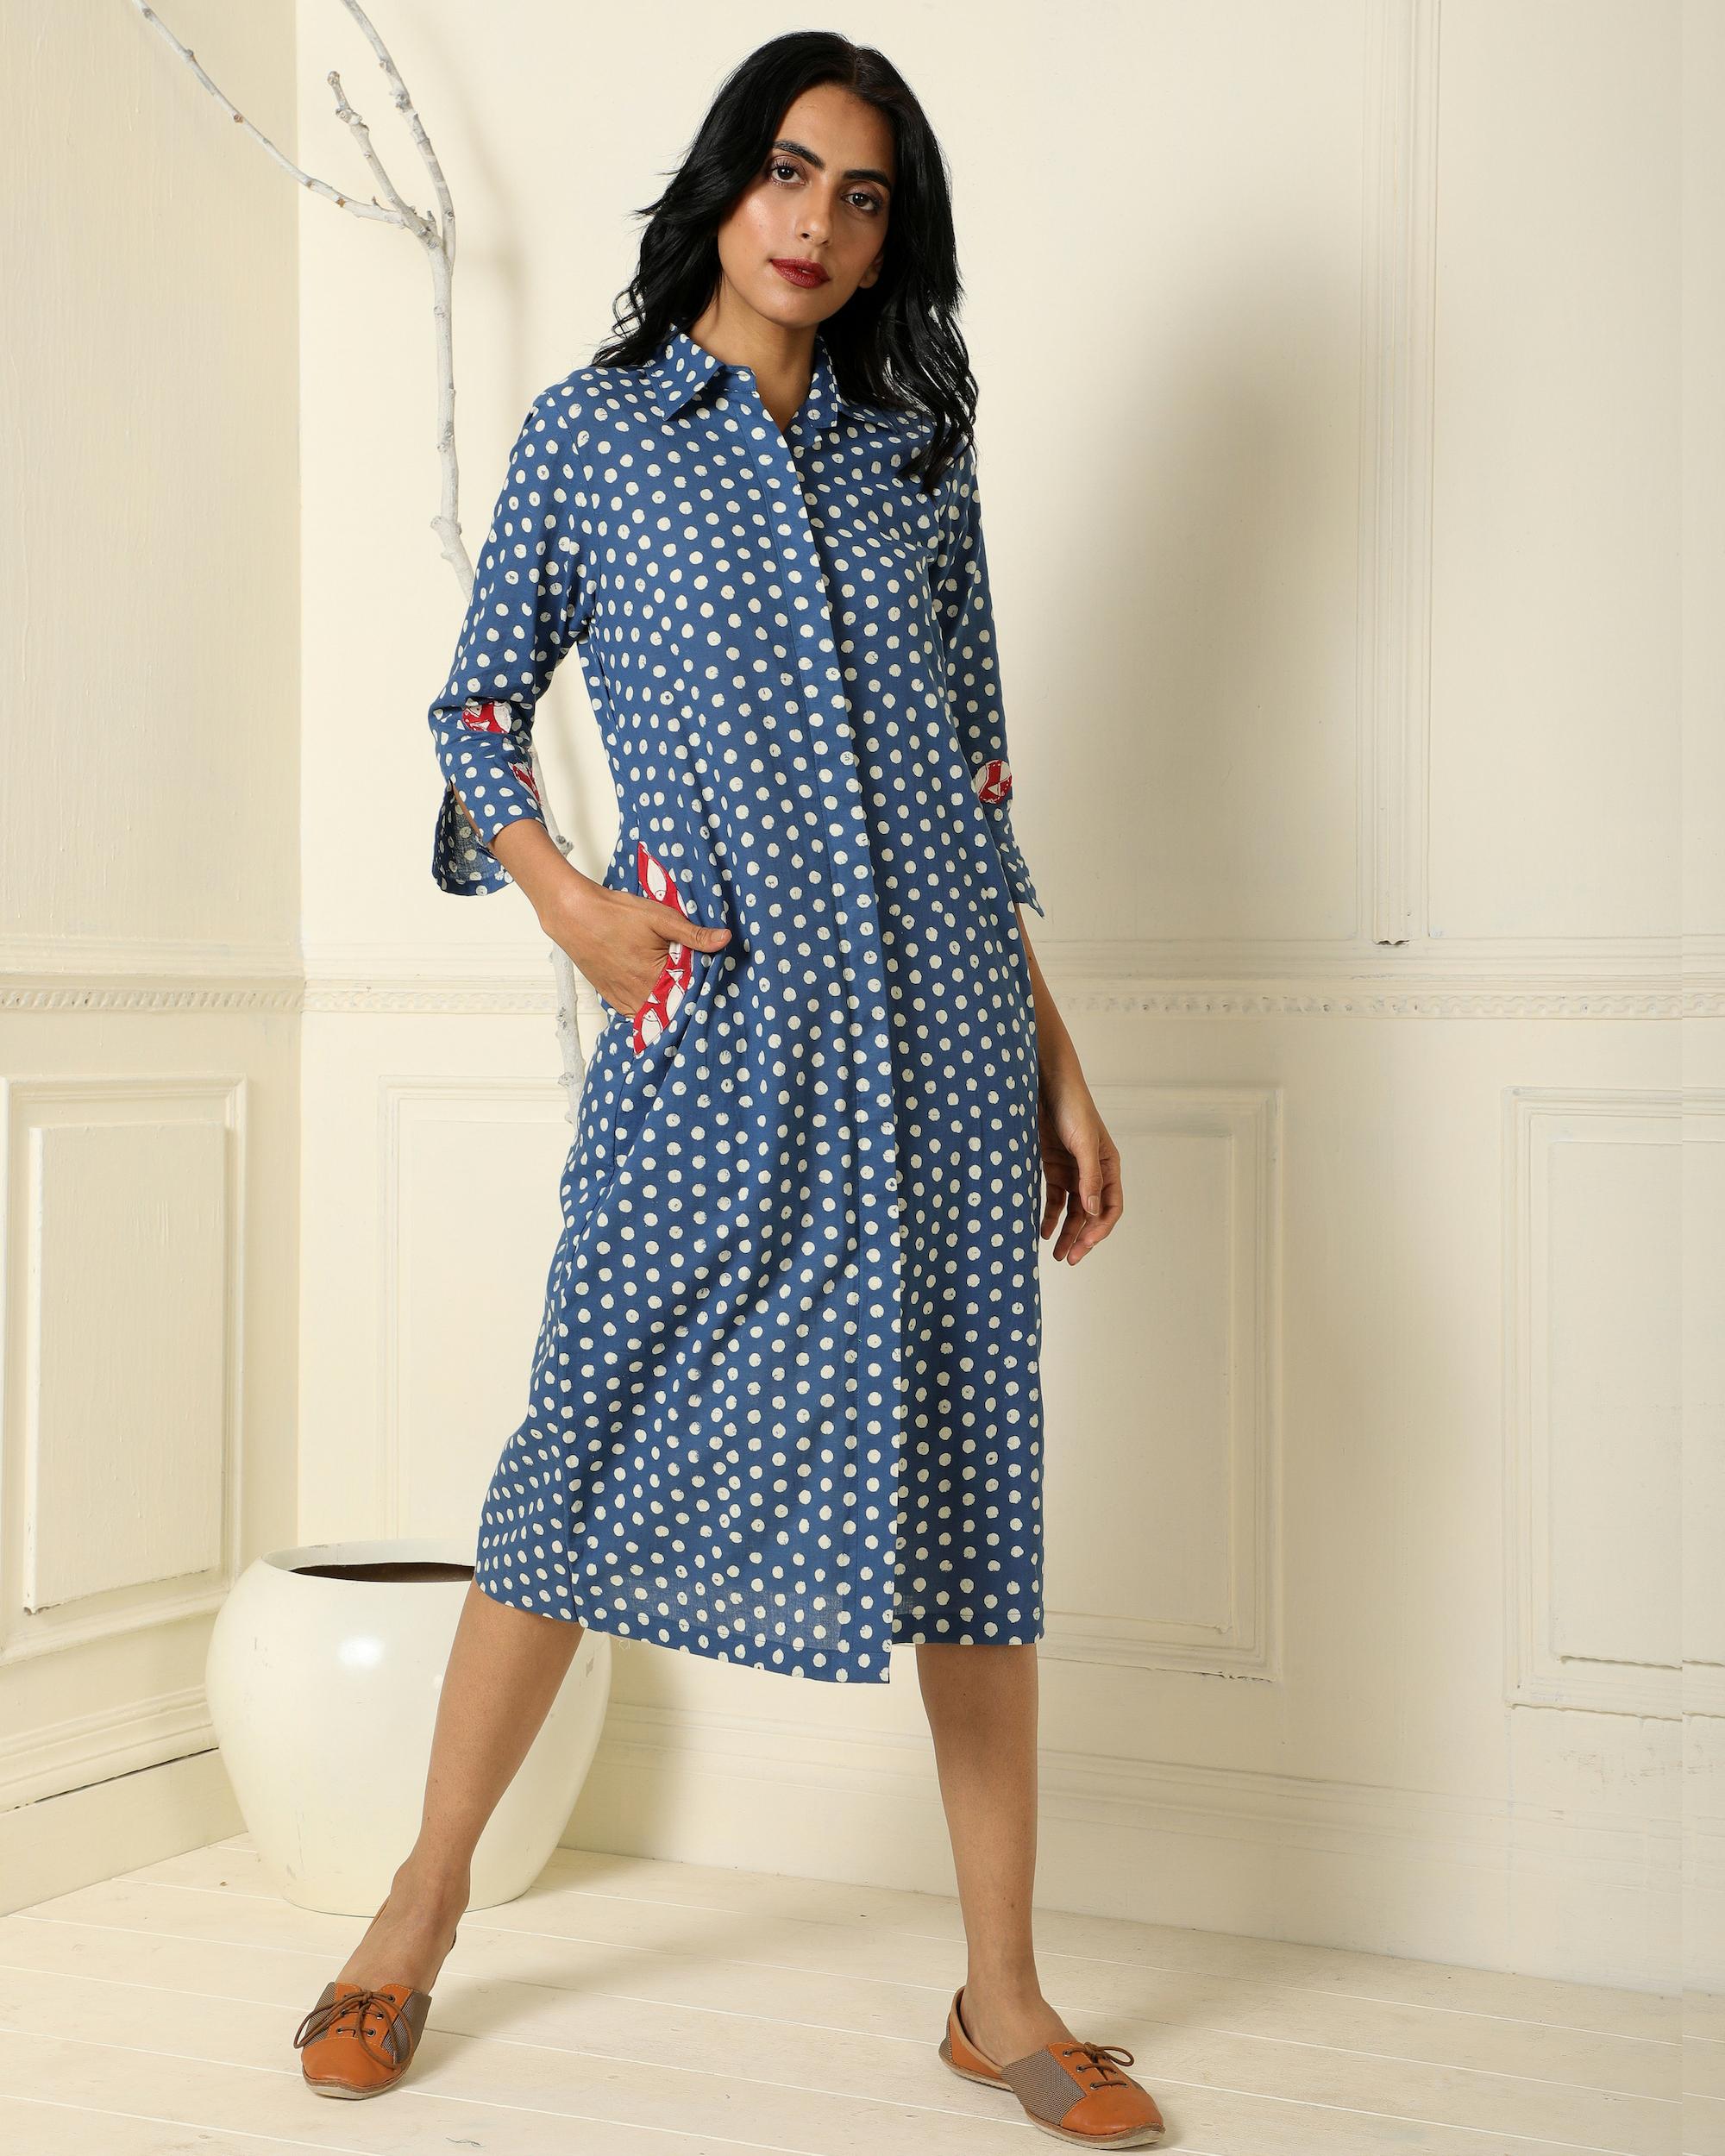 Indigo polka dot dress